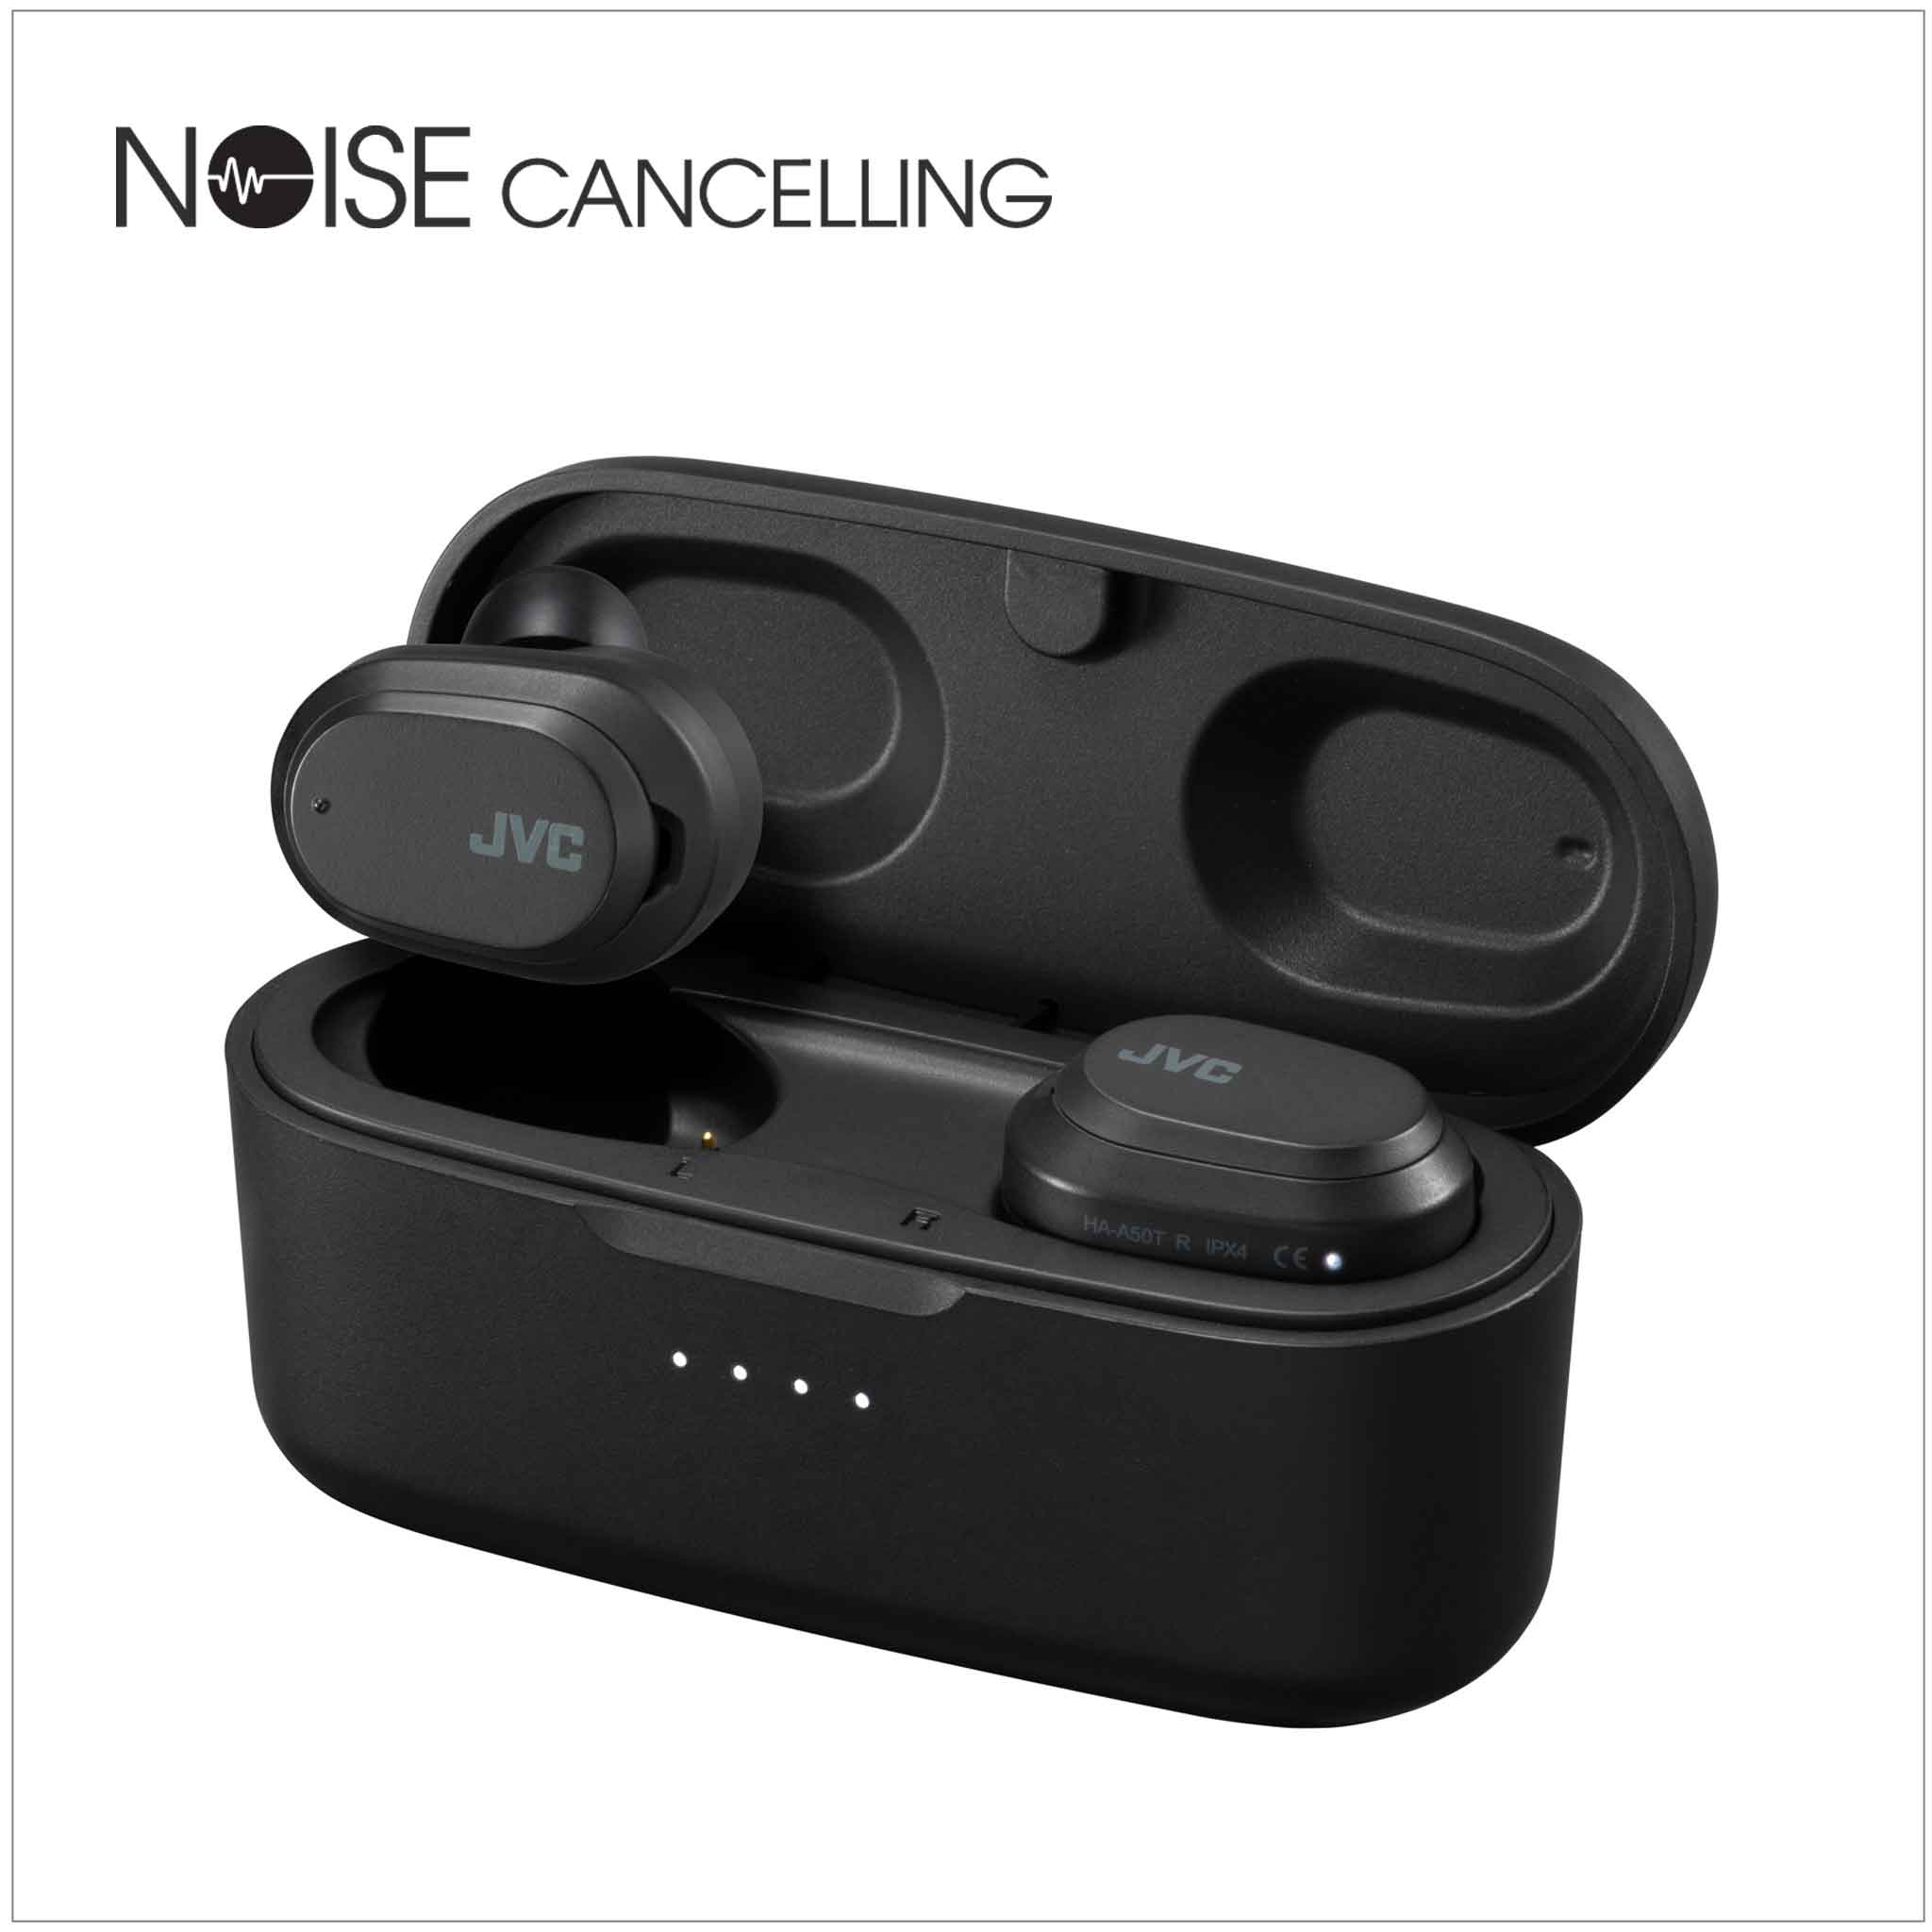 HA-A50T noise canceling earbuds